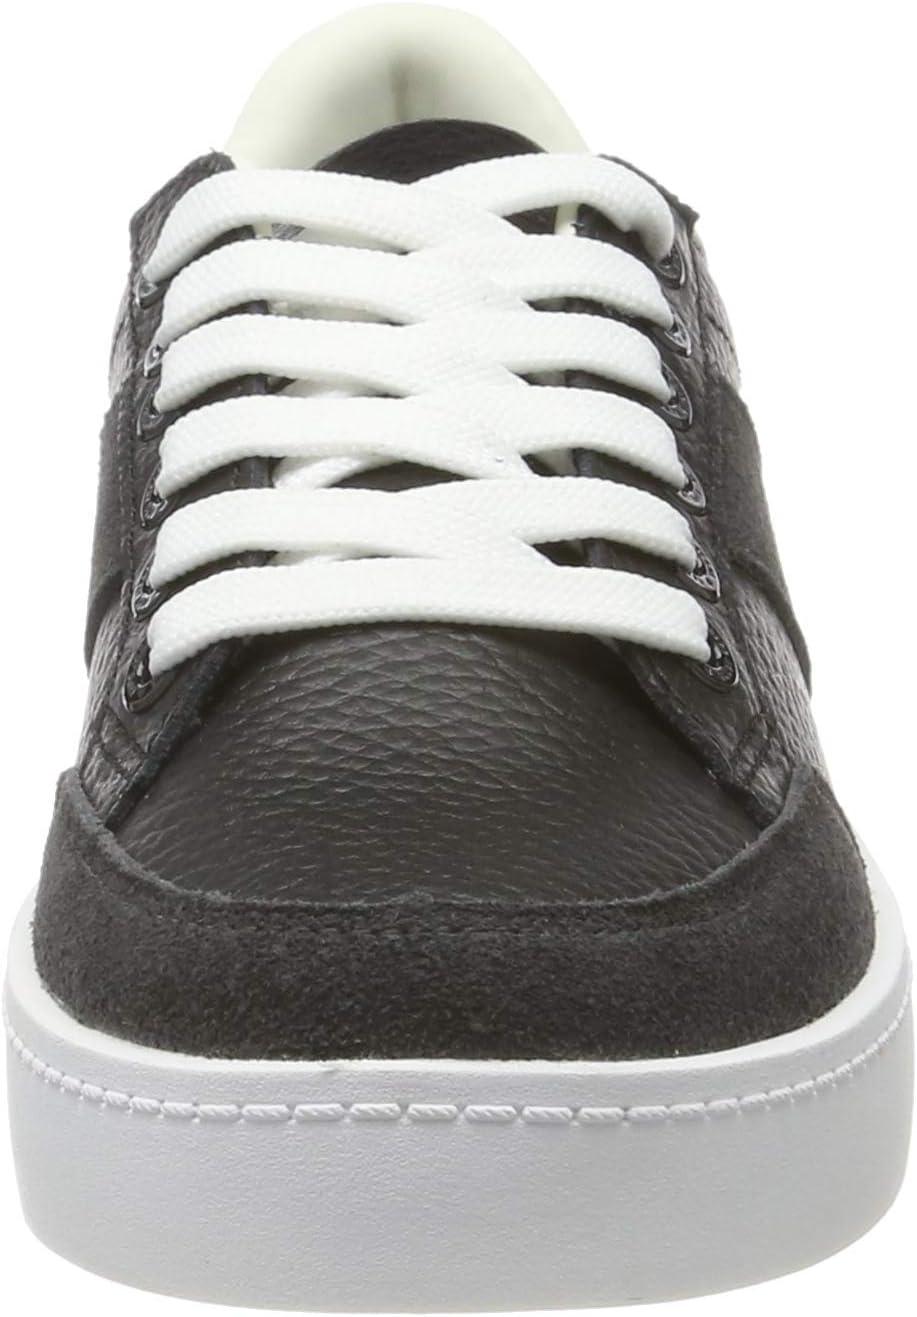 Pepe Jeans dames Brixton Tape Low-Top Sneakers Black Black 999